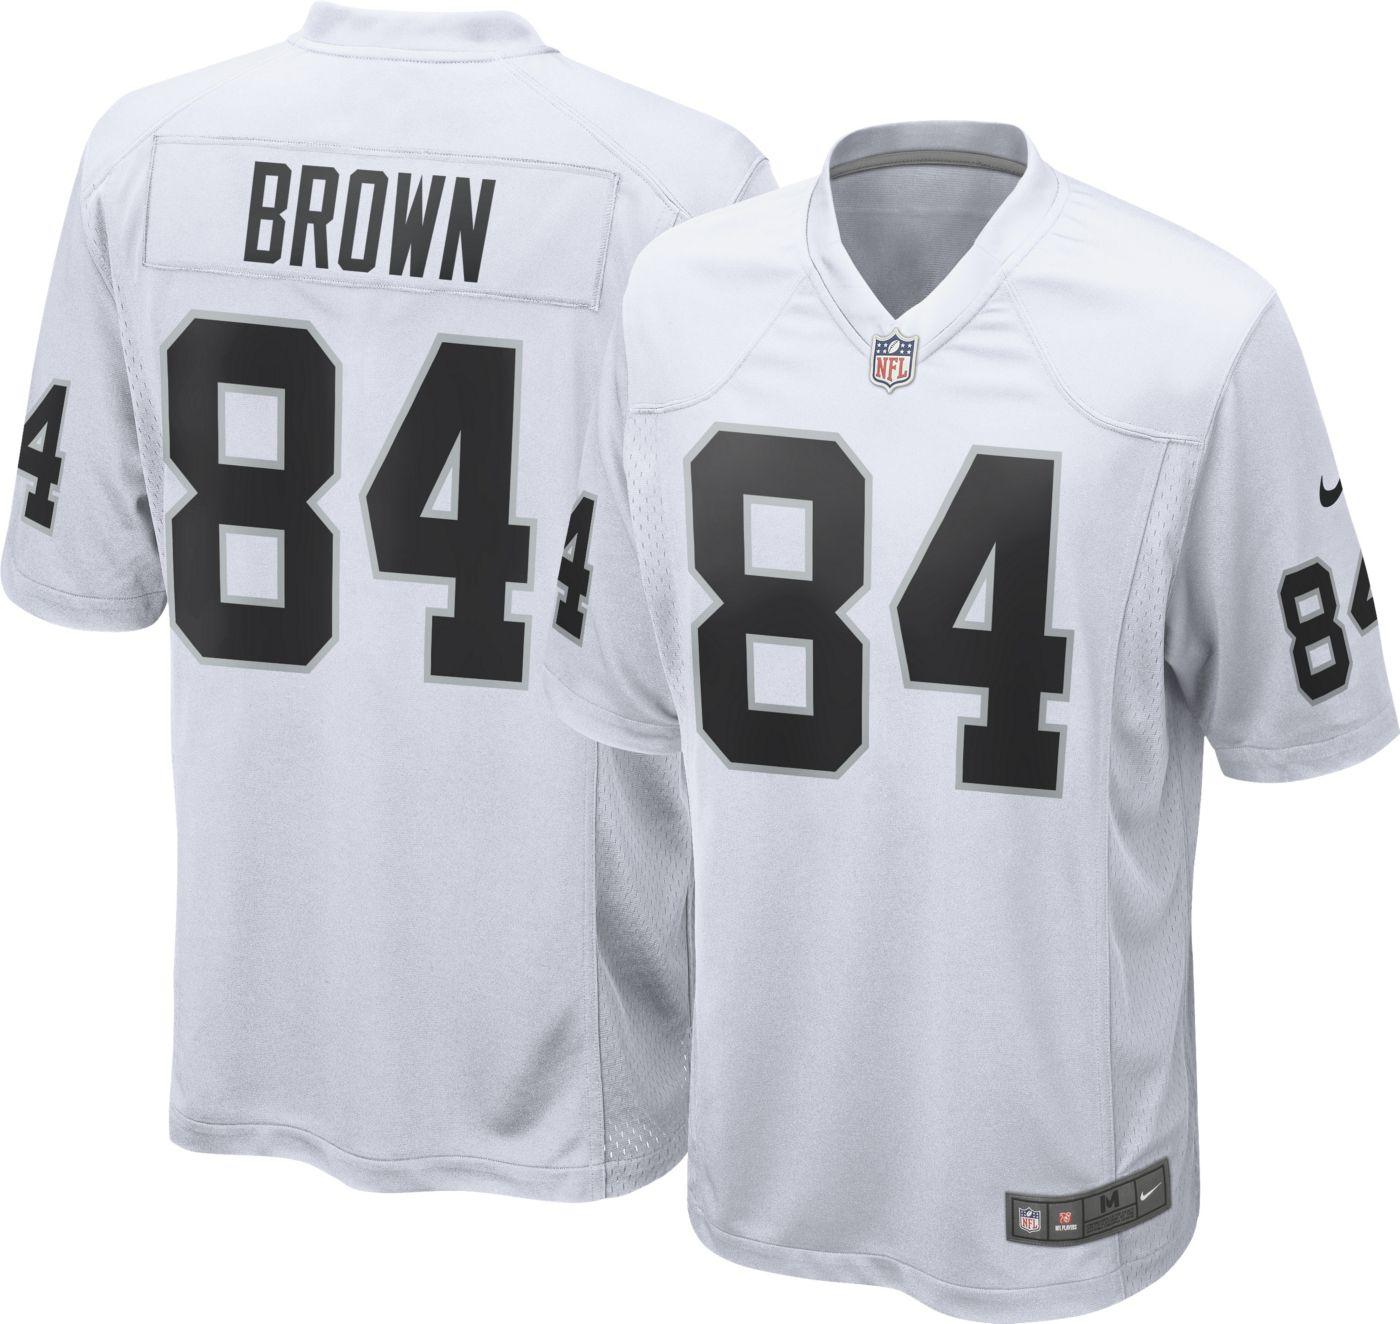 Antonio Brown Nike Men's Oakland Raiders Away Game Jersey